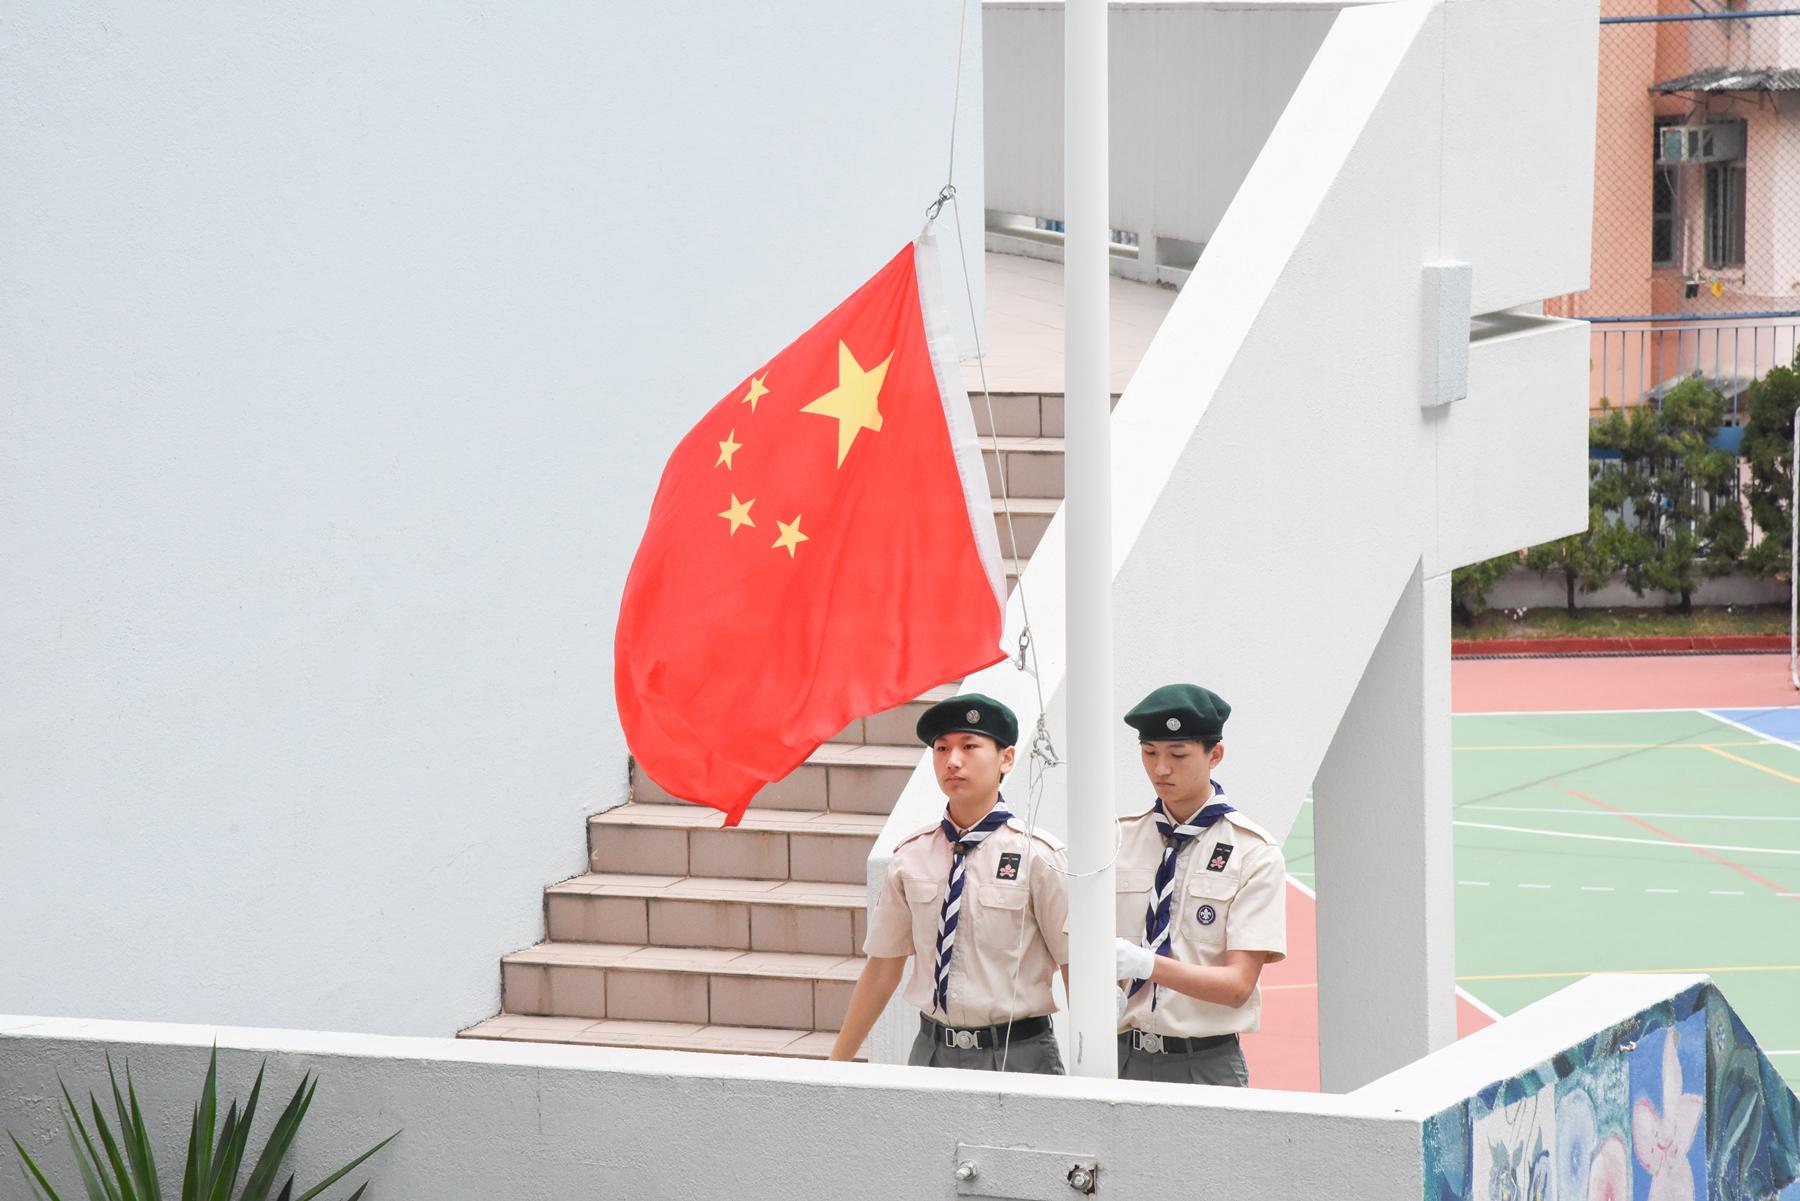 http://npc.edu.hk/sites/default/files/dsc_2566.jpg